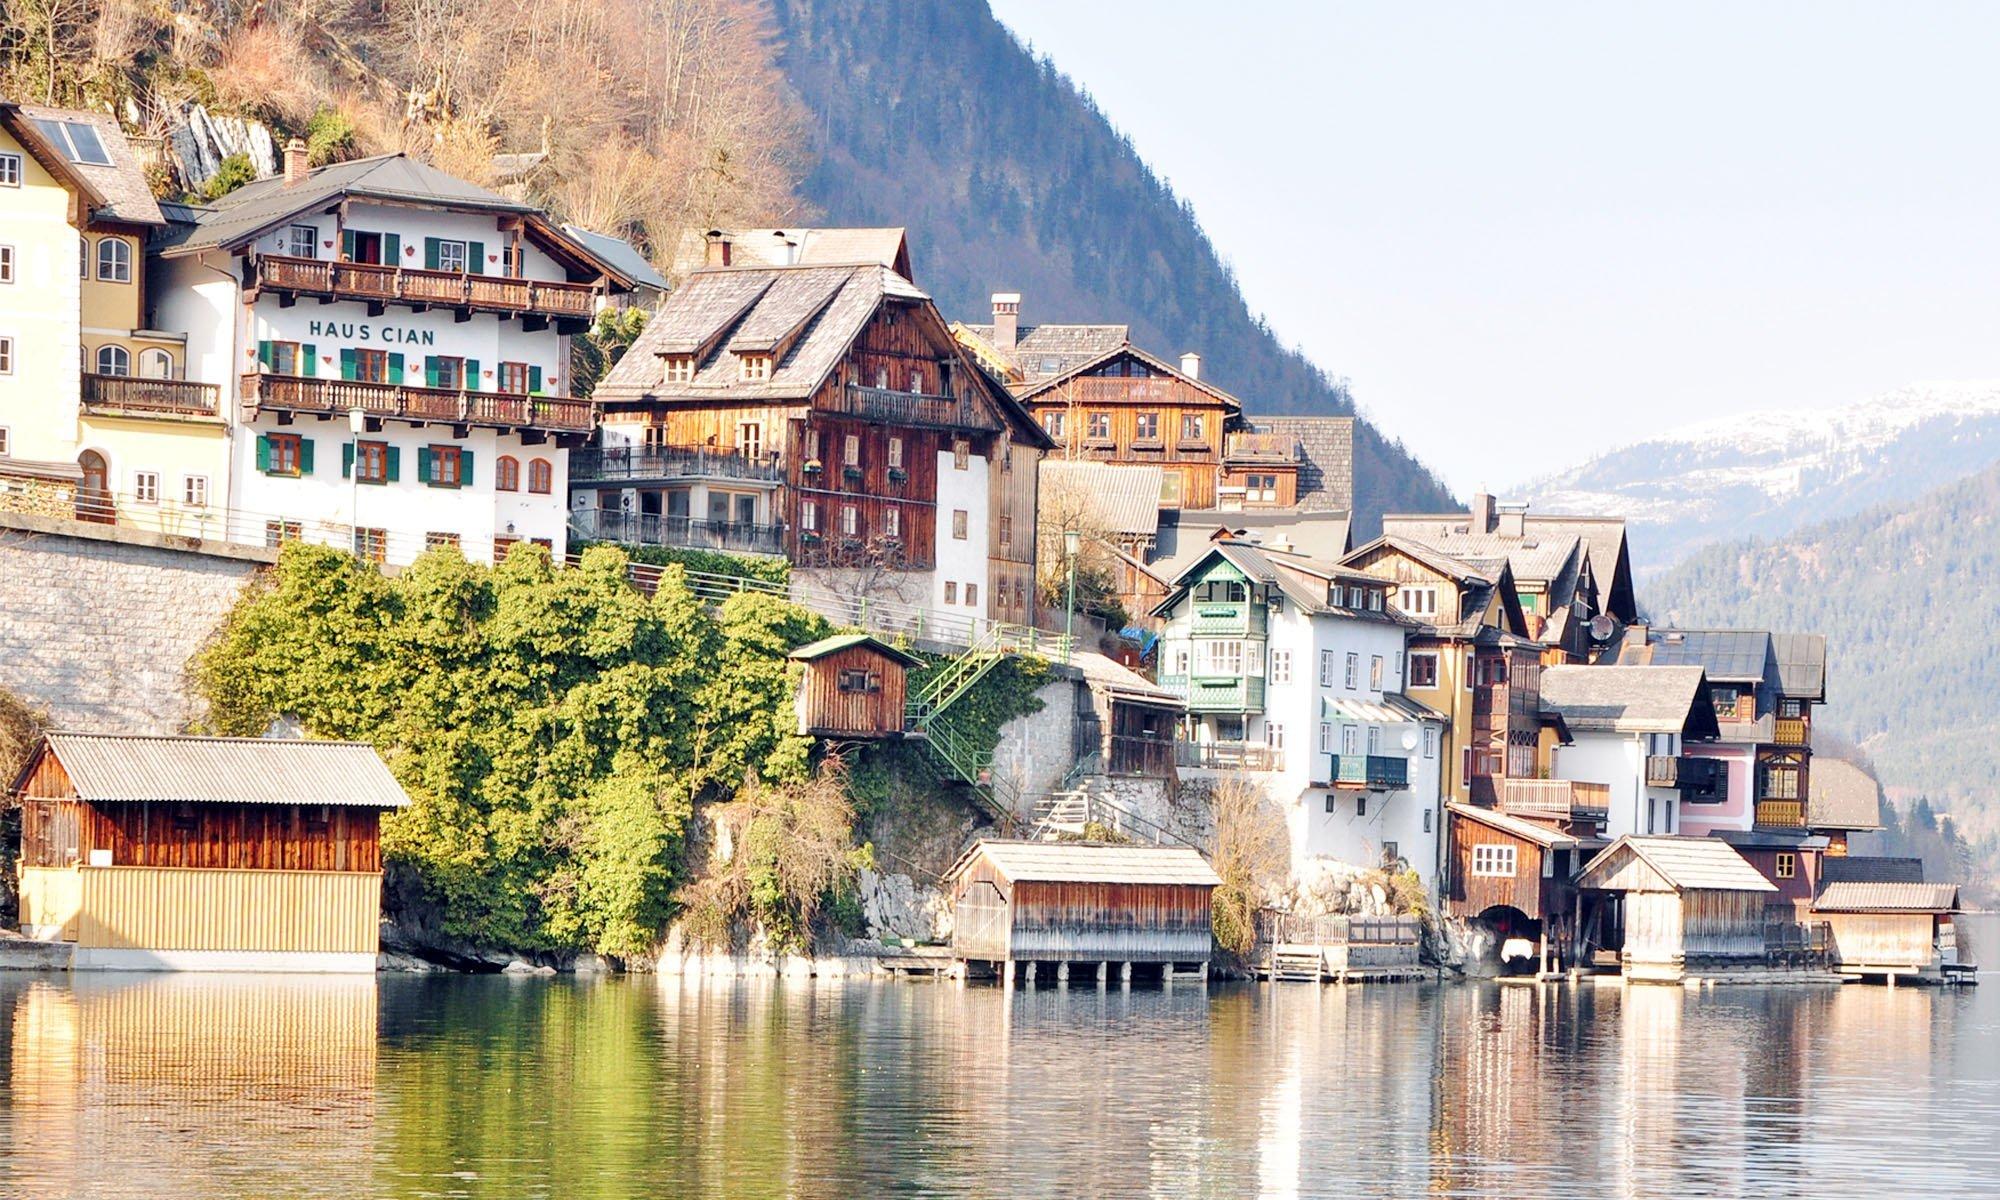 Where To Stay In Hallstatt 5 Gorgeous Hotels In Austrias